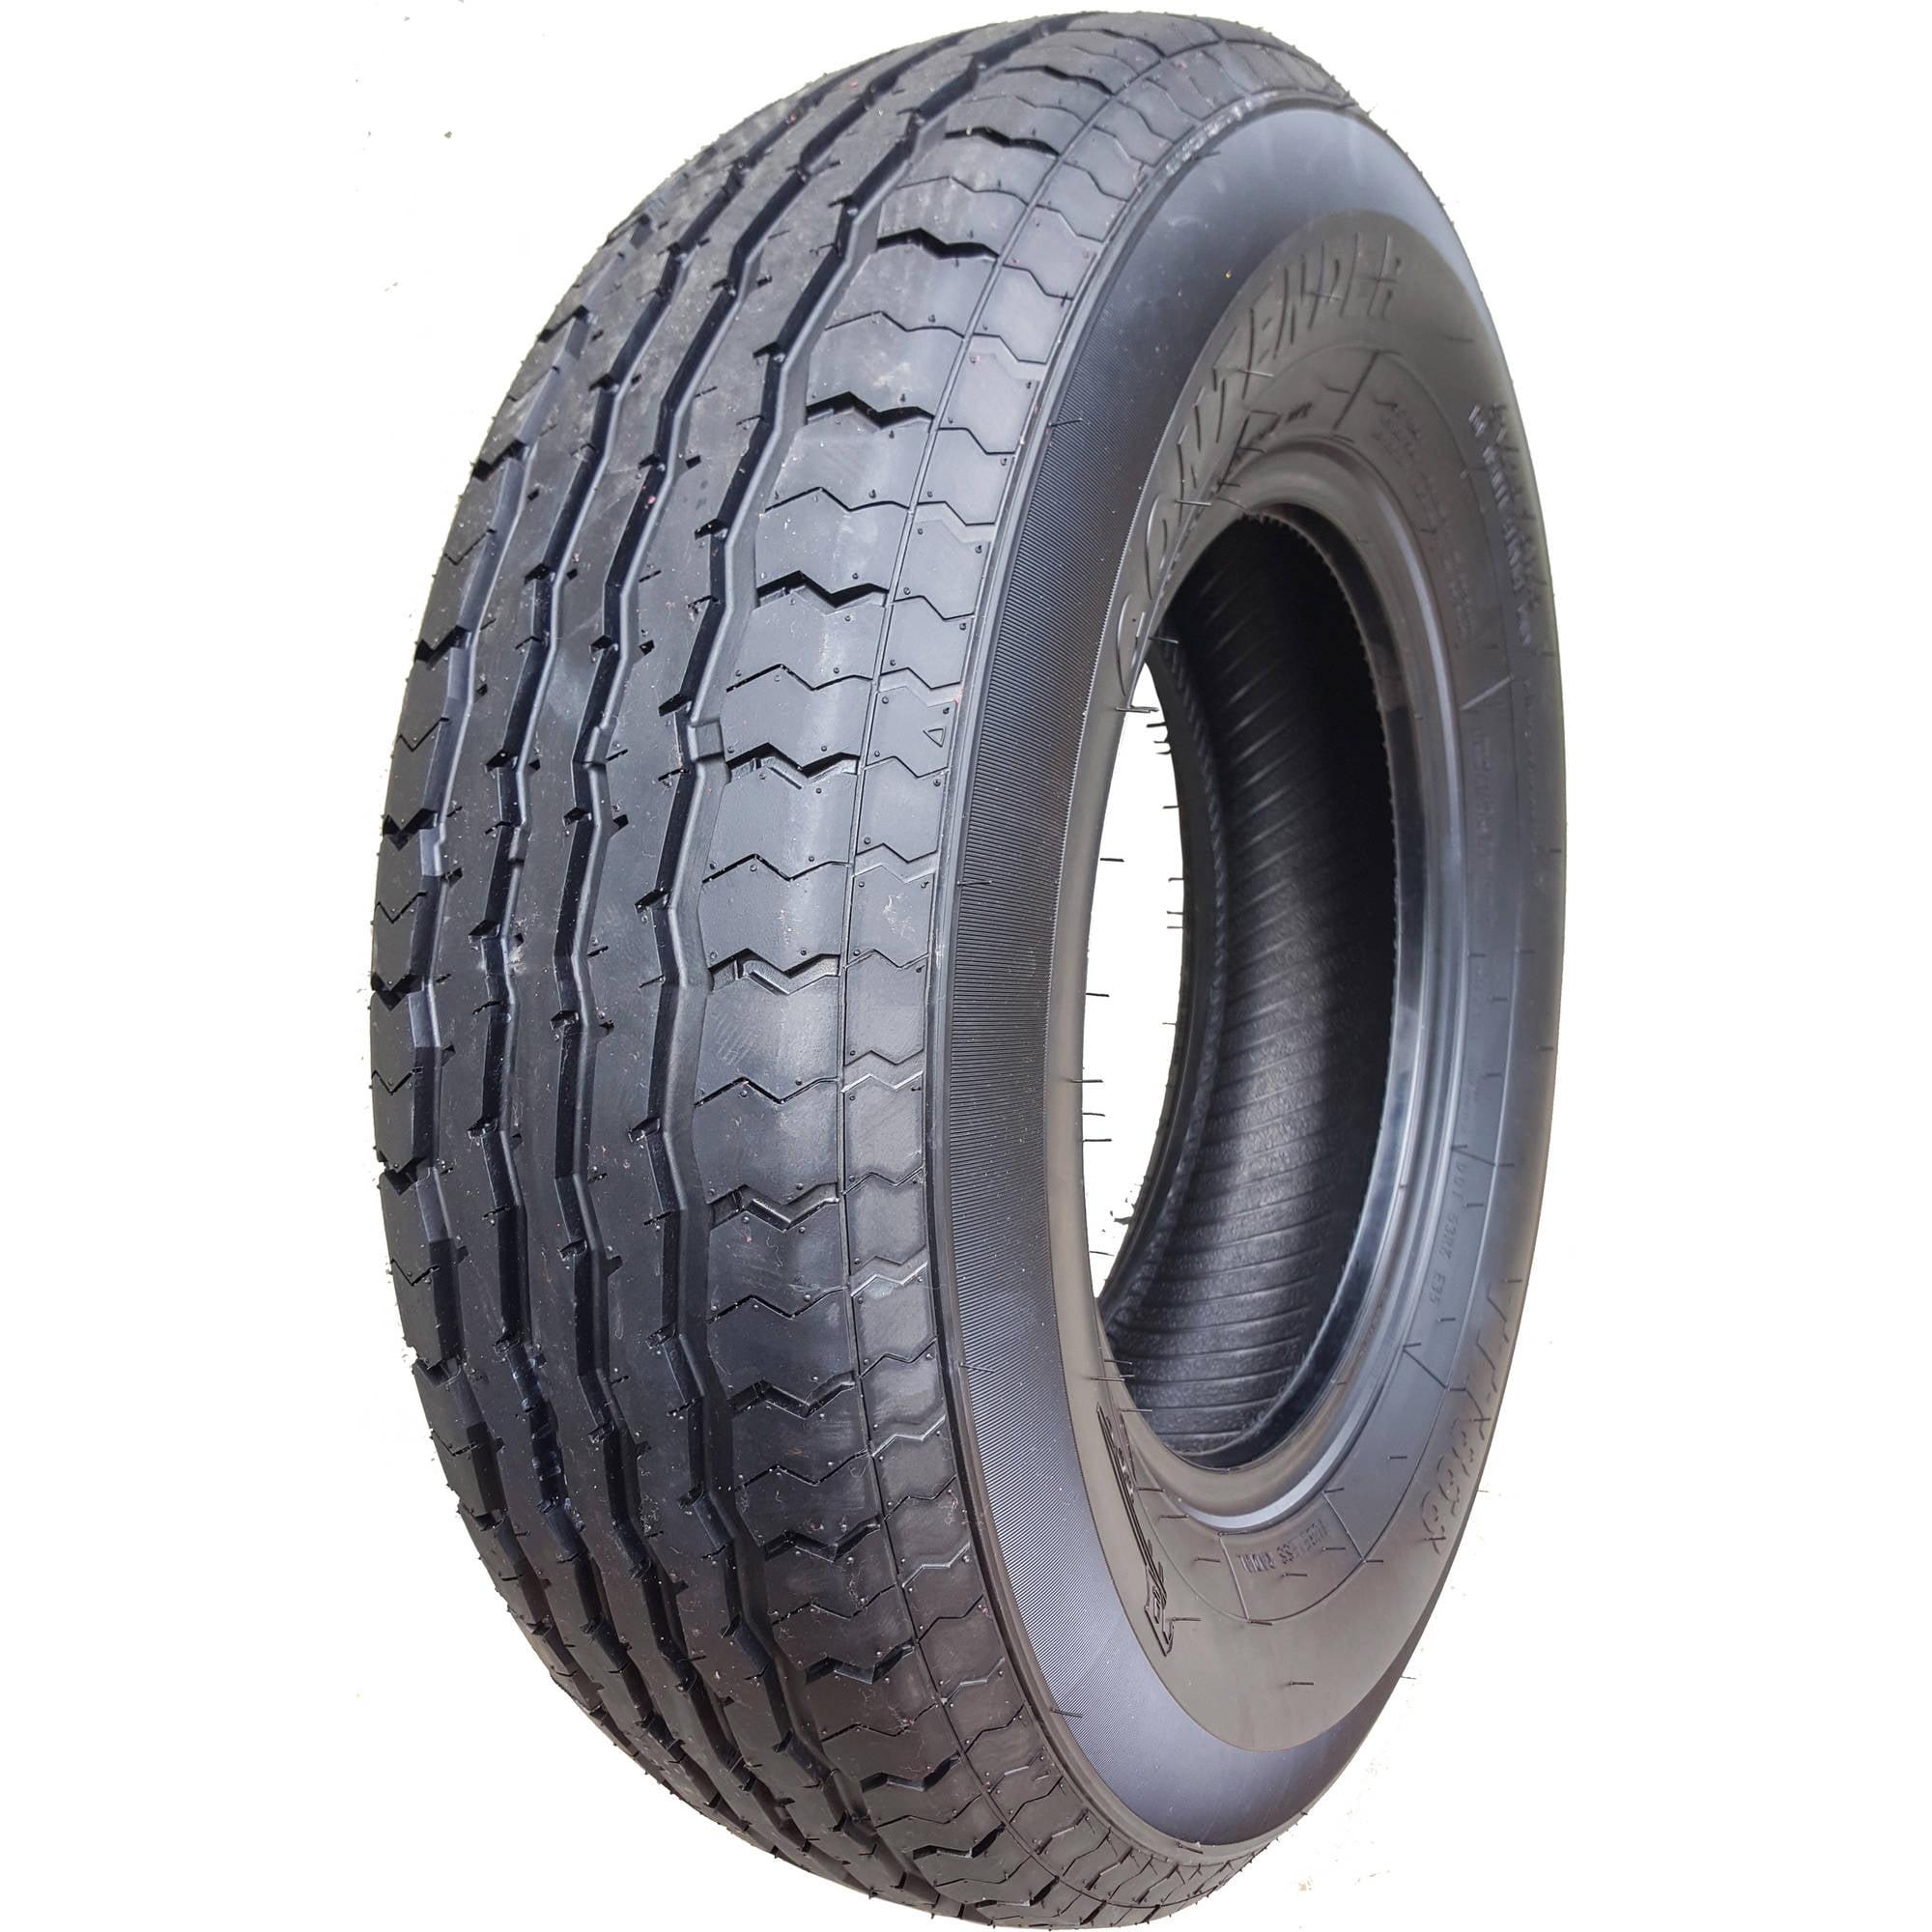 ST225/75R15, Load Range E, Trailer Tire